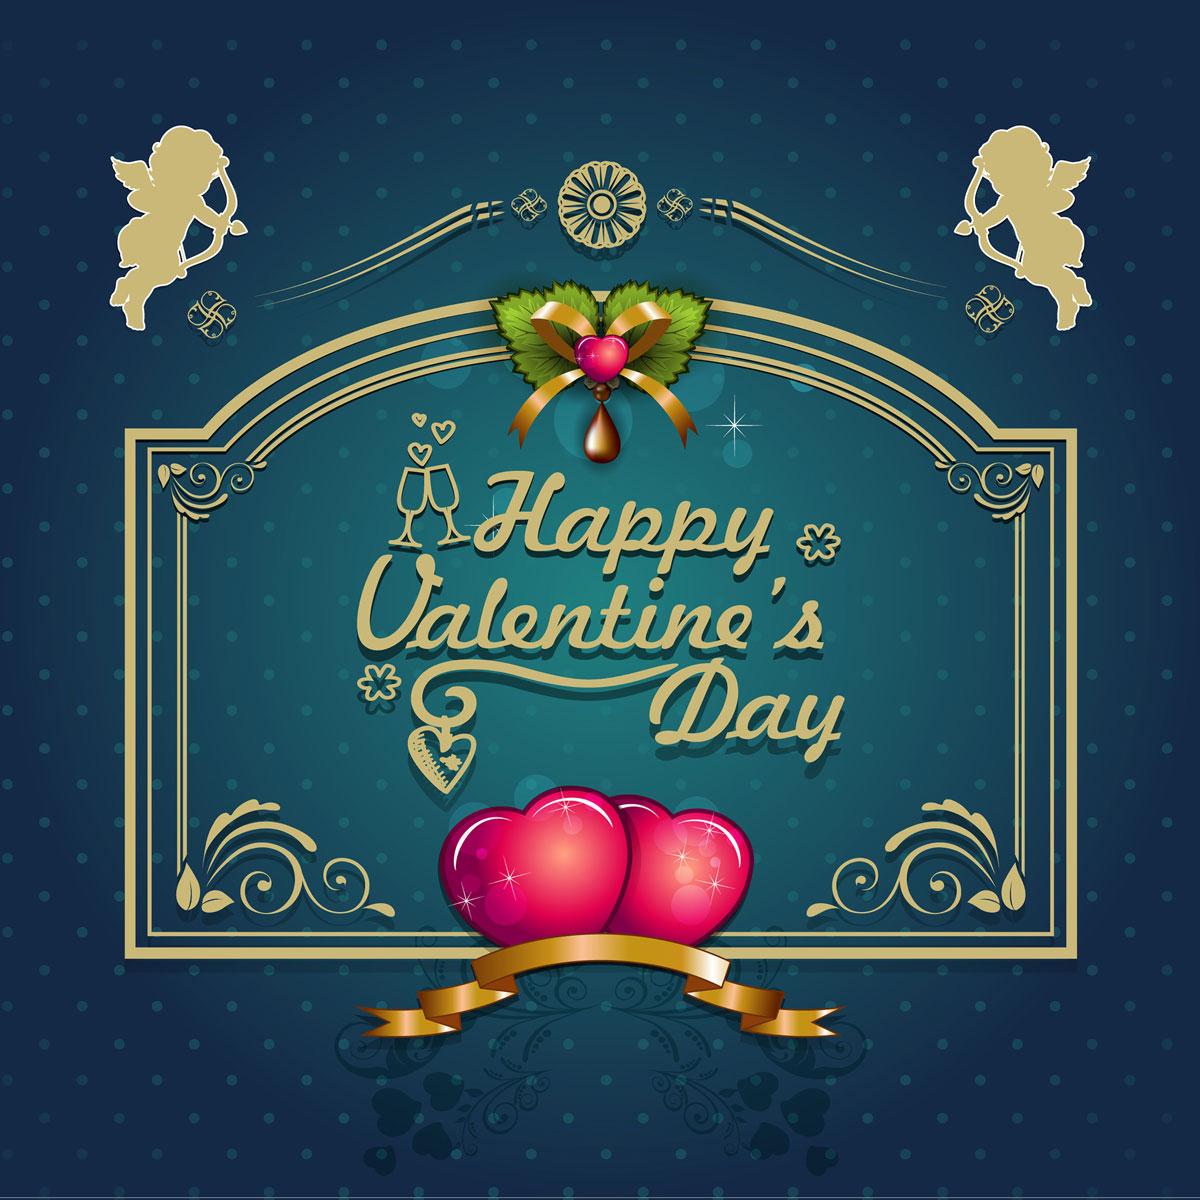 13款情人节七夕节爱心心形宣传海报设计AI矢量素材 Valentines Day Heart-shaped Vector Poster插图6